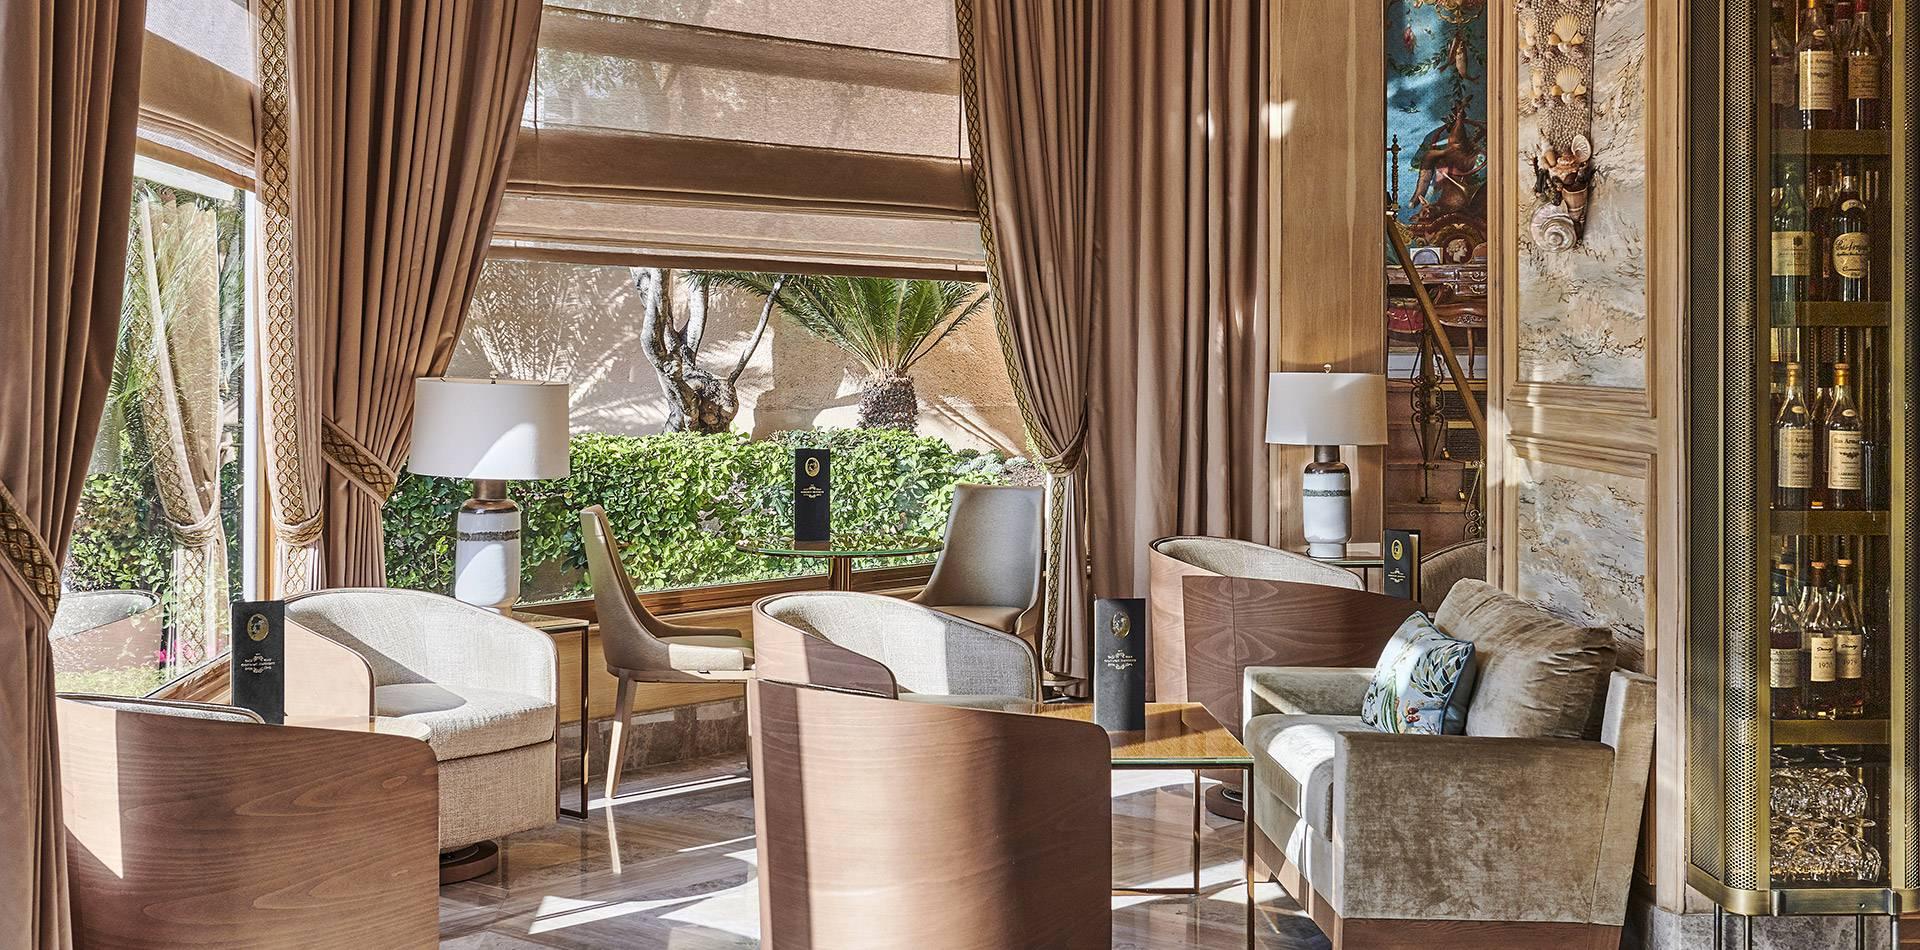 Die Bar Gordon Bennett | Luxusbar An Der Côte D'Azur encequiconcerne Salon De Jardin Bennett